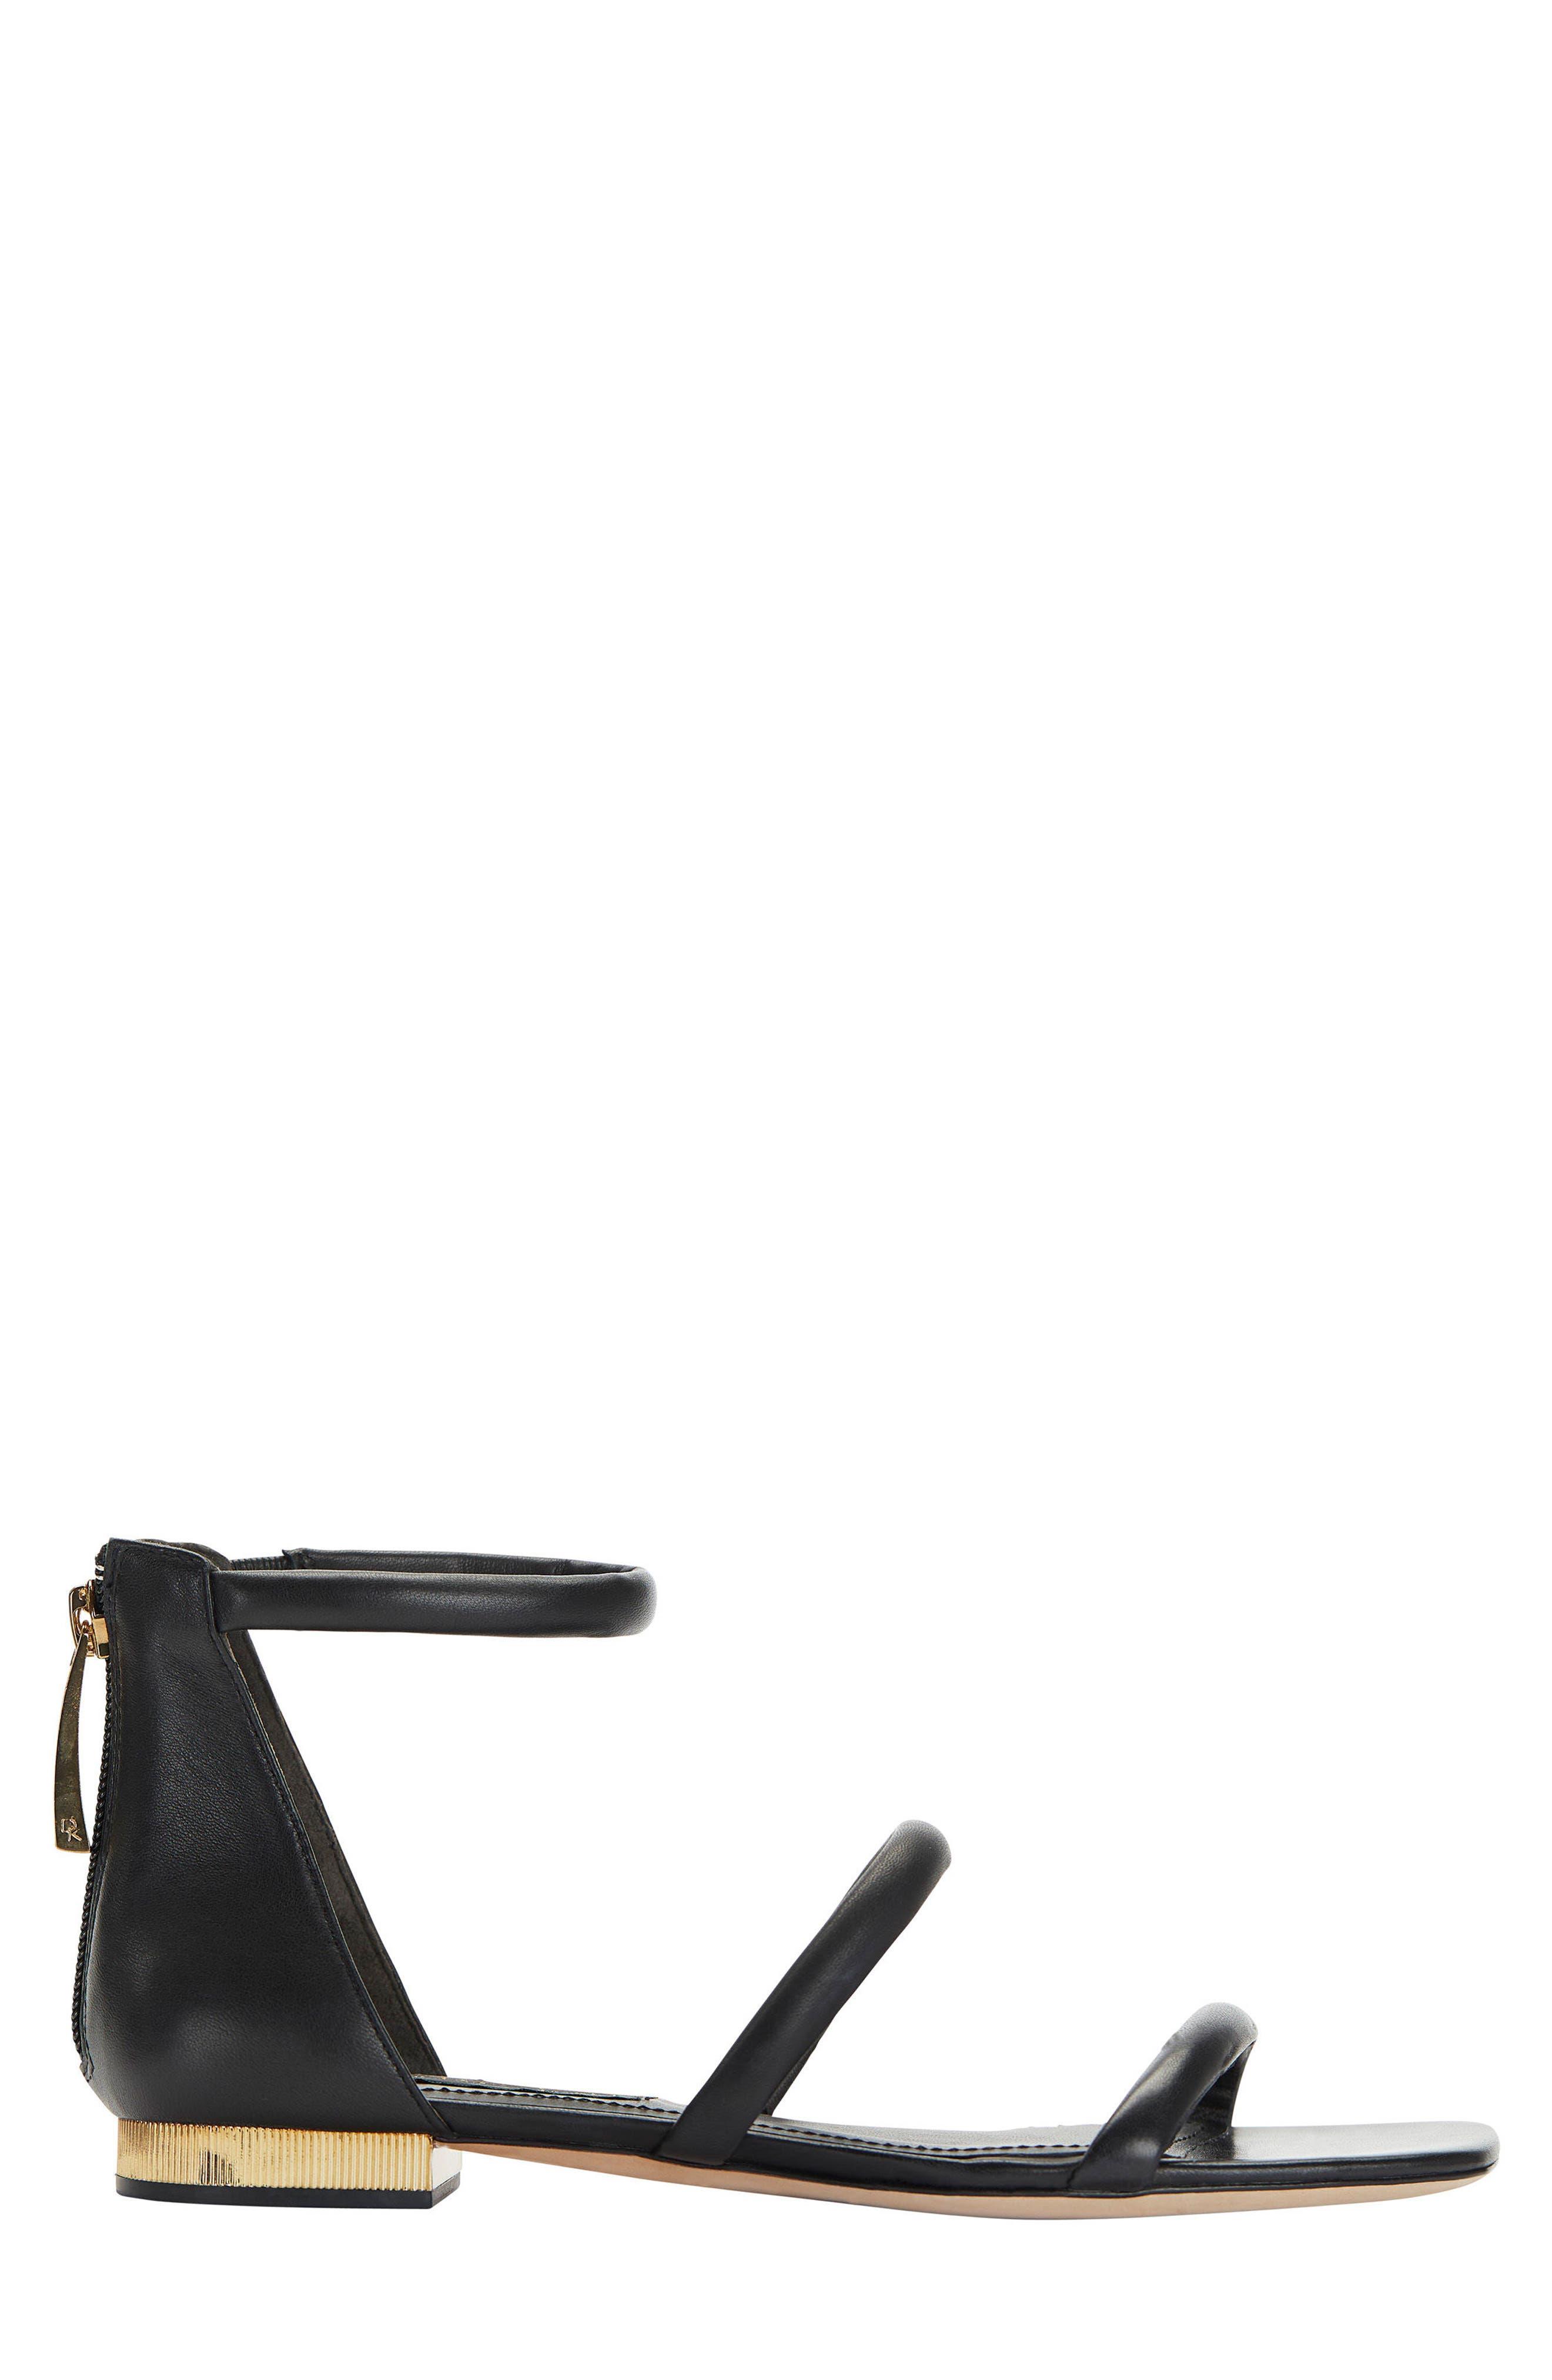 Donna Karan Galina Sandal,                             Alternate thumbnail 3, color,                             Black Leather